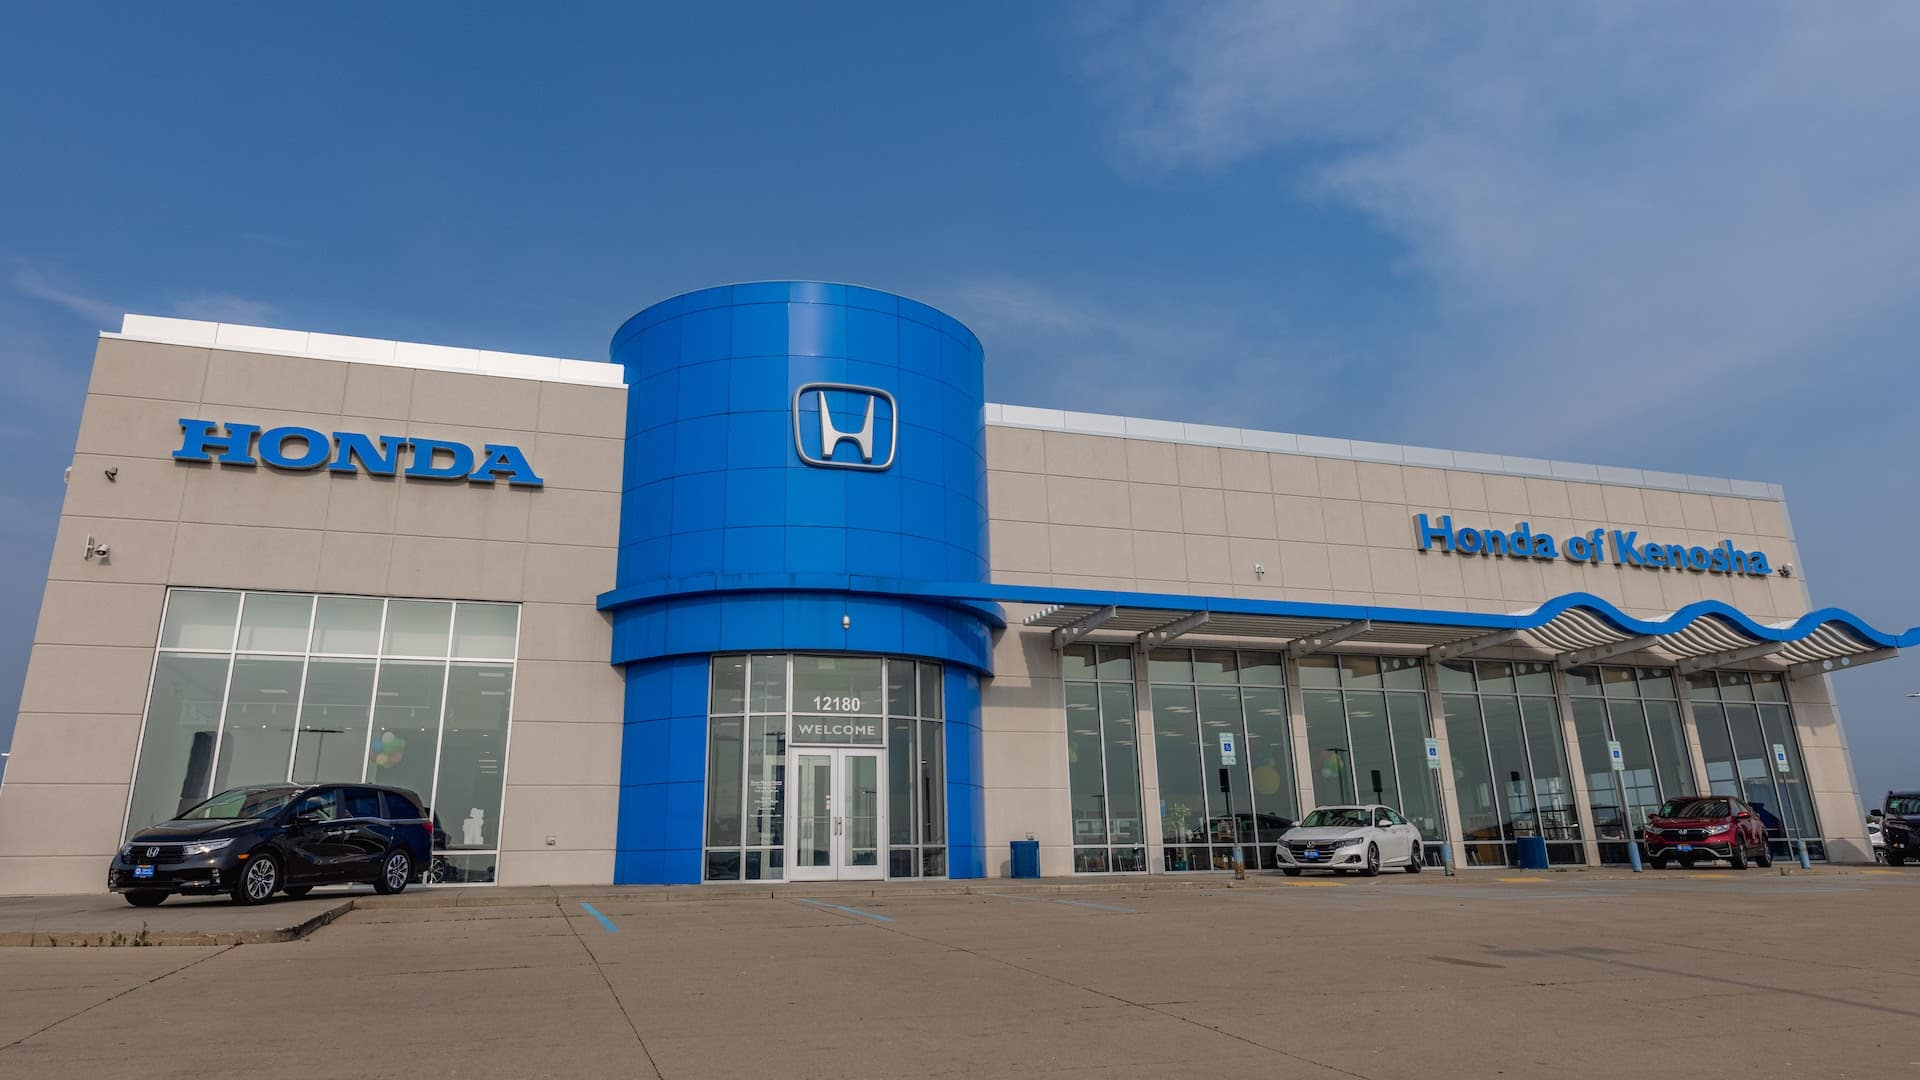 An exterior shot of a Honda dealership.